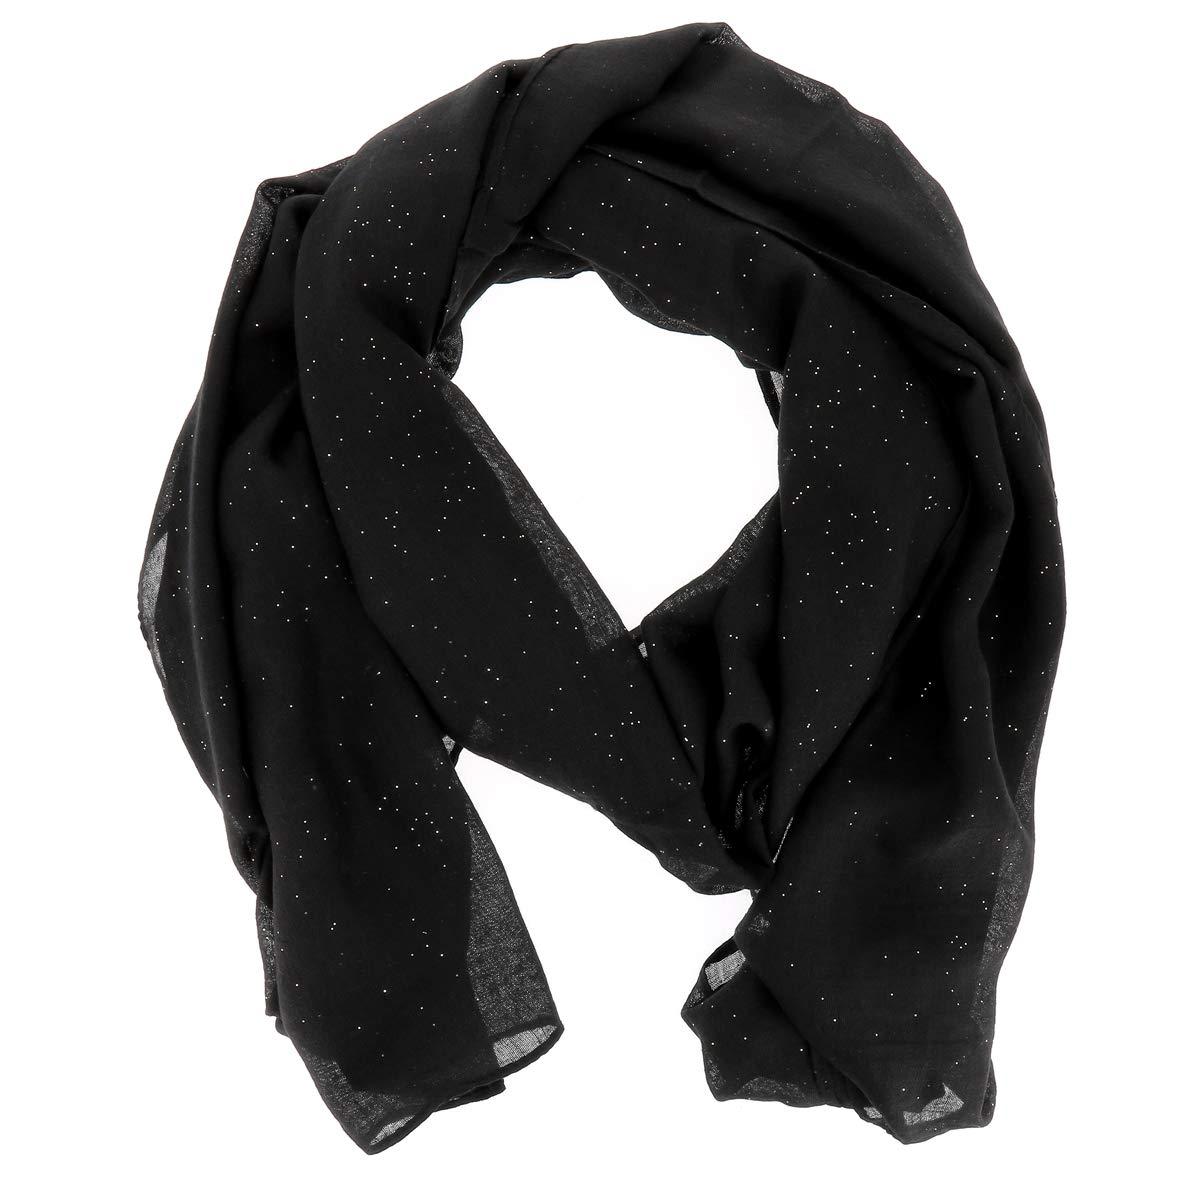 8f480e82d11f Foulard Noir Paillette - Foulard Femme - Echarpe Femme - Foulard Paillette  - Etole - Foulard